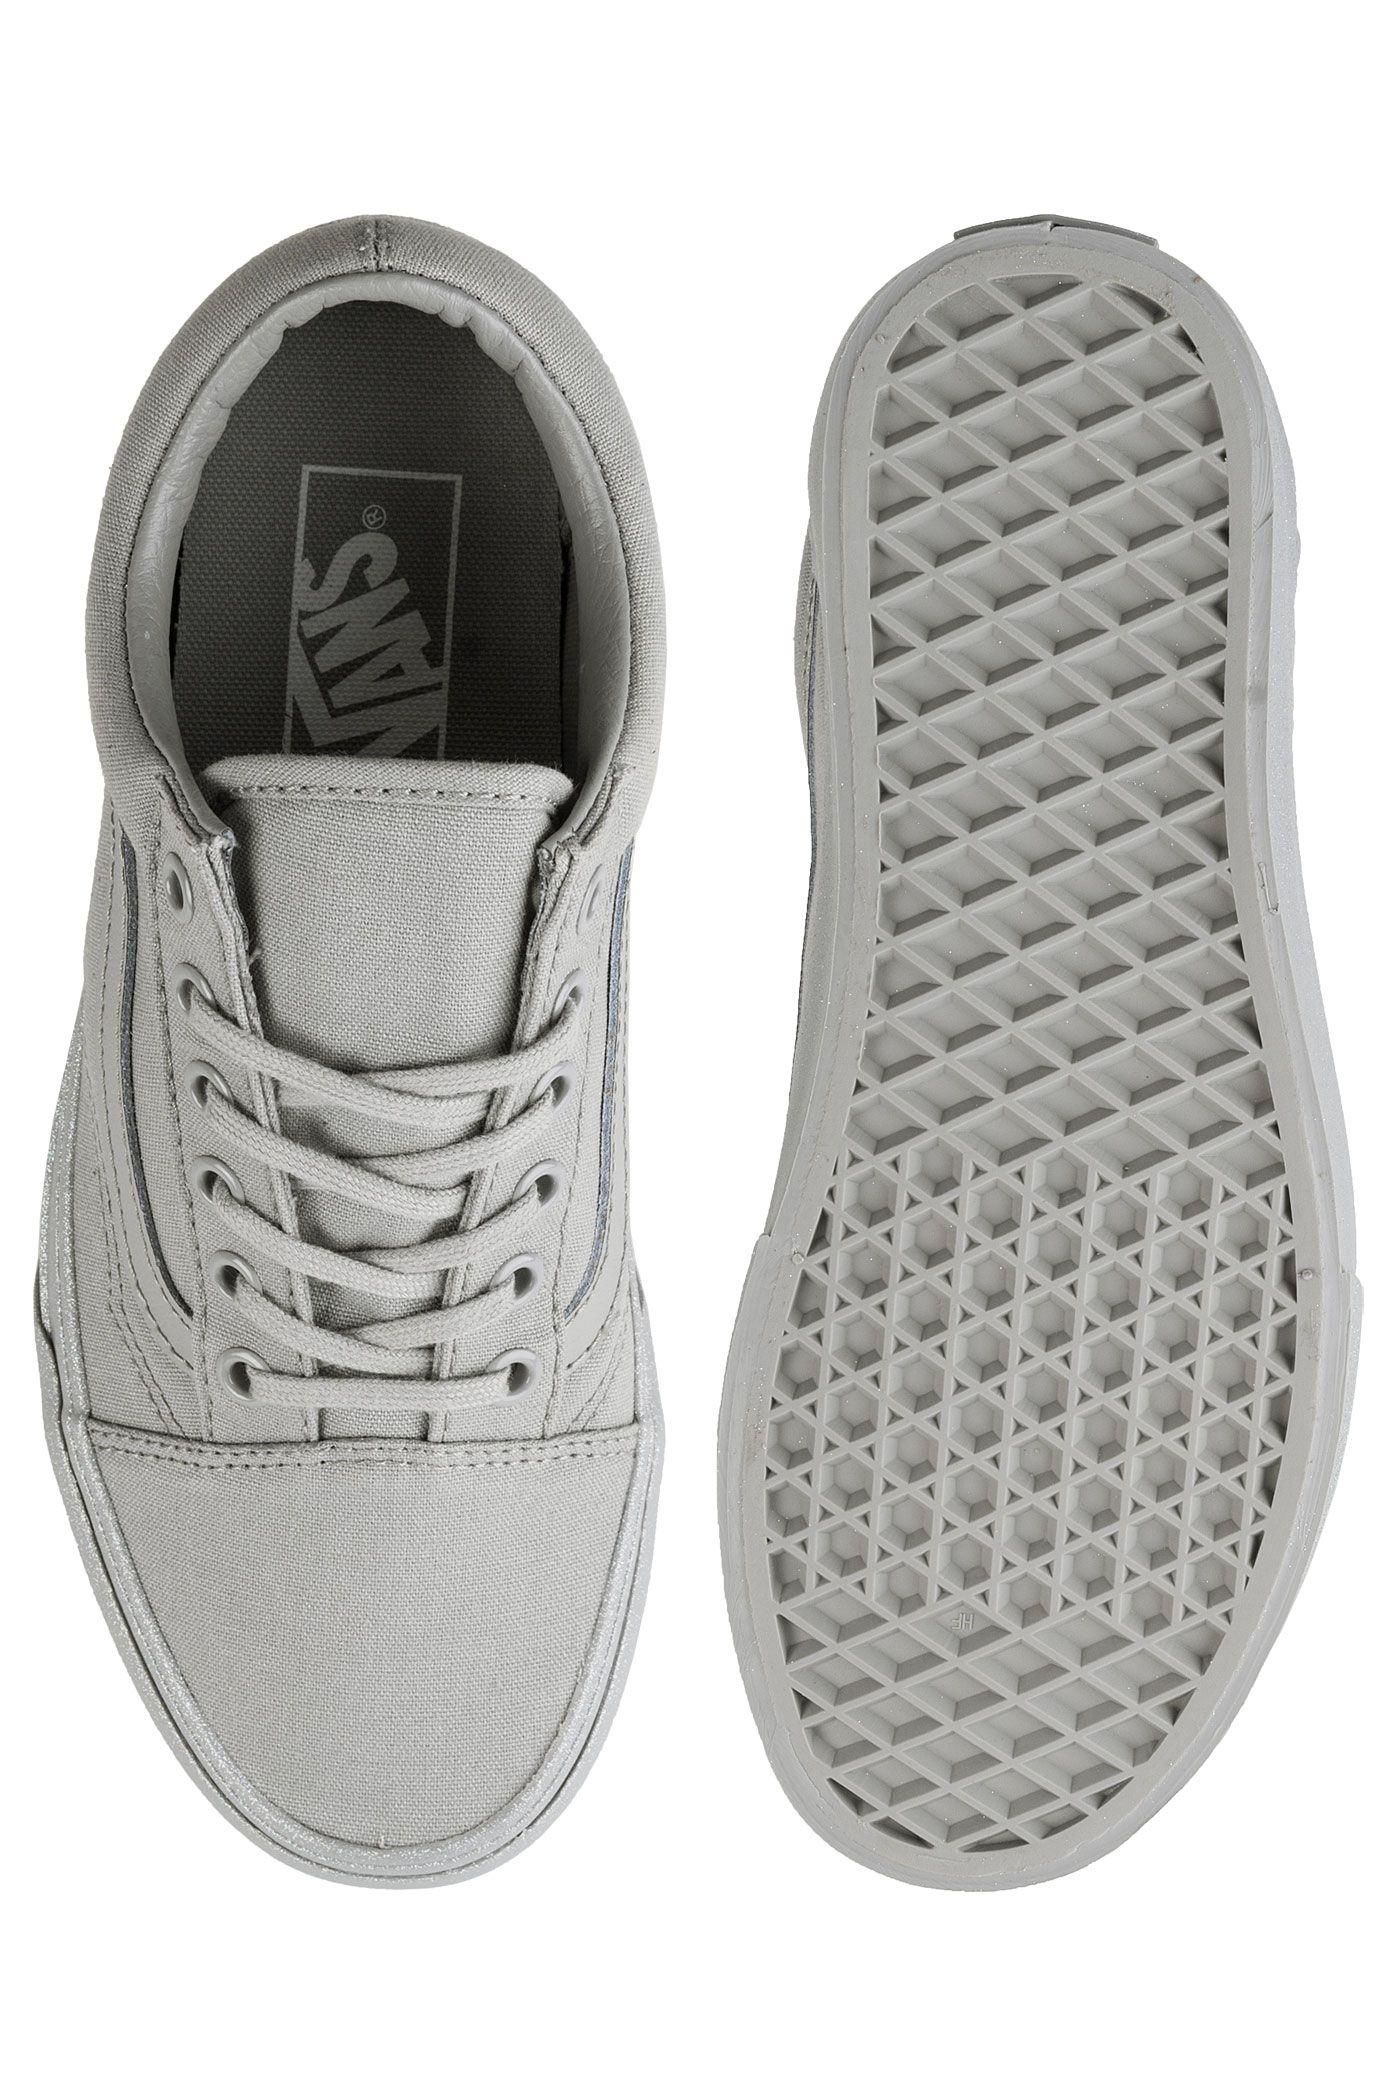 0848f653a3 Vans Classic Slip-On Plateau Schuh women (black white checkerboard ...